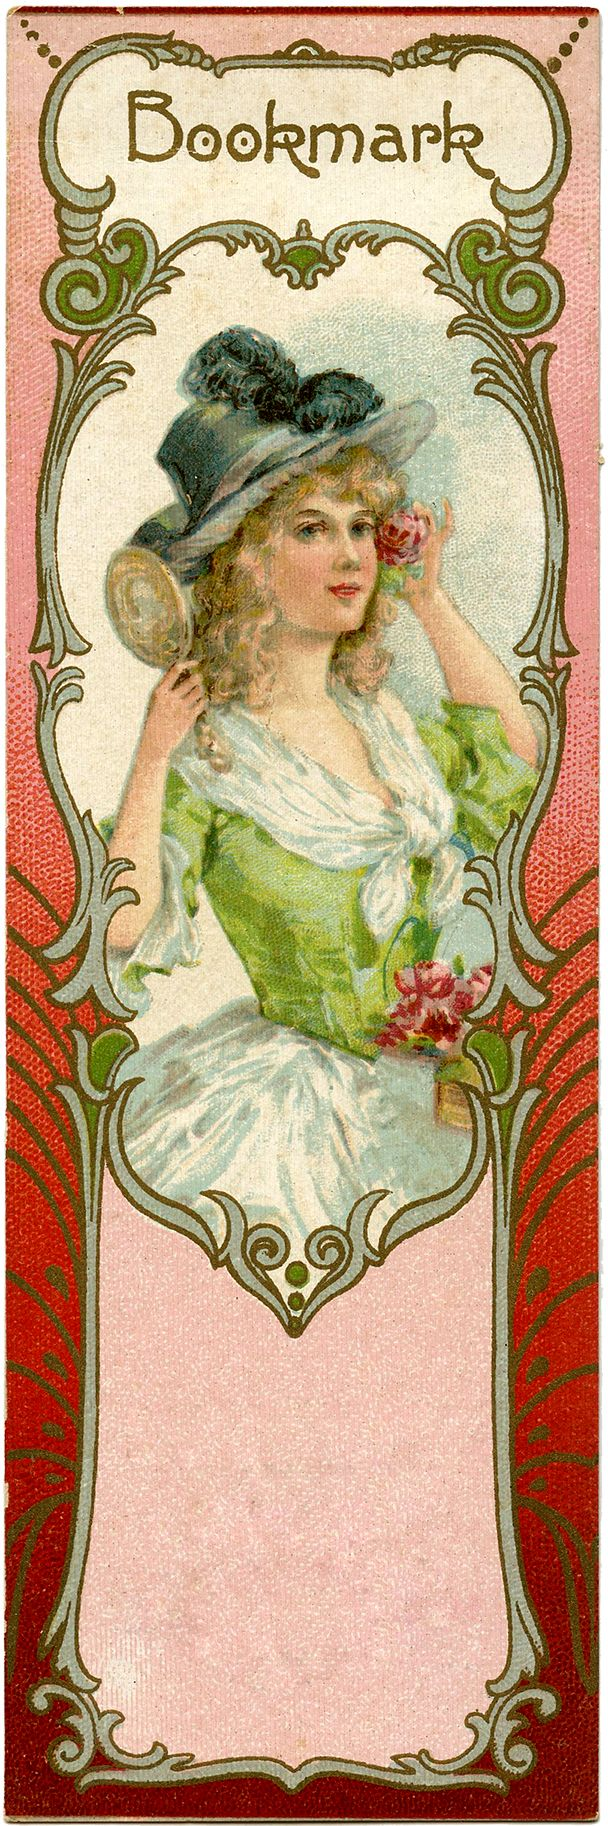 Vintage Bookmark Image